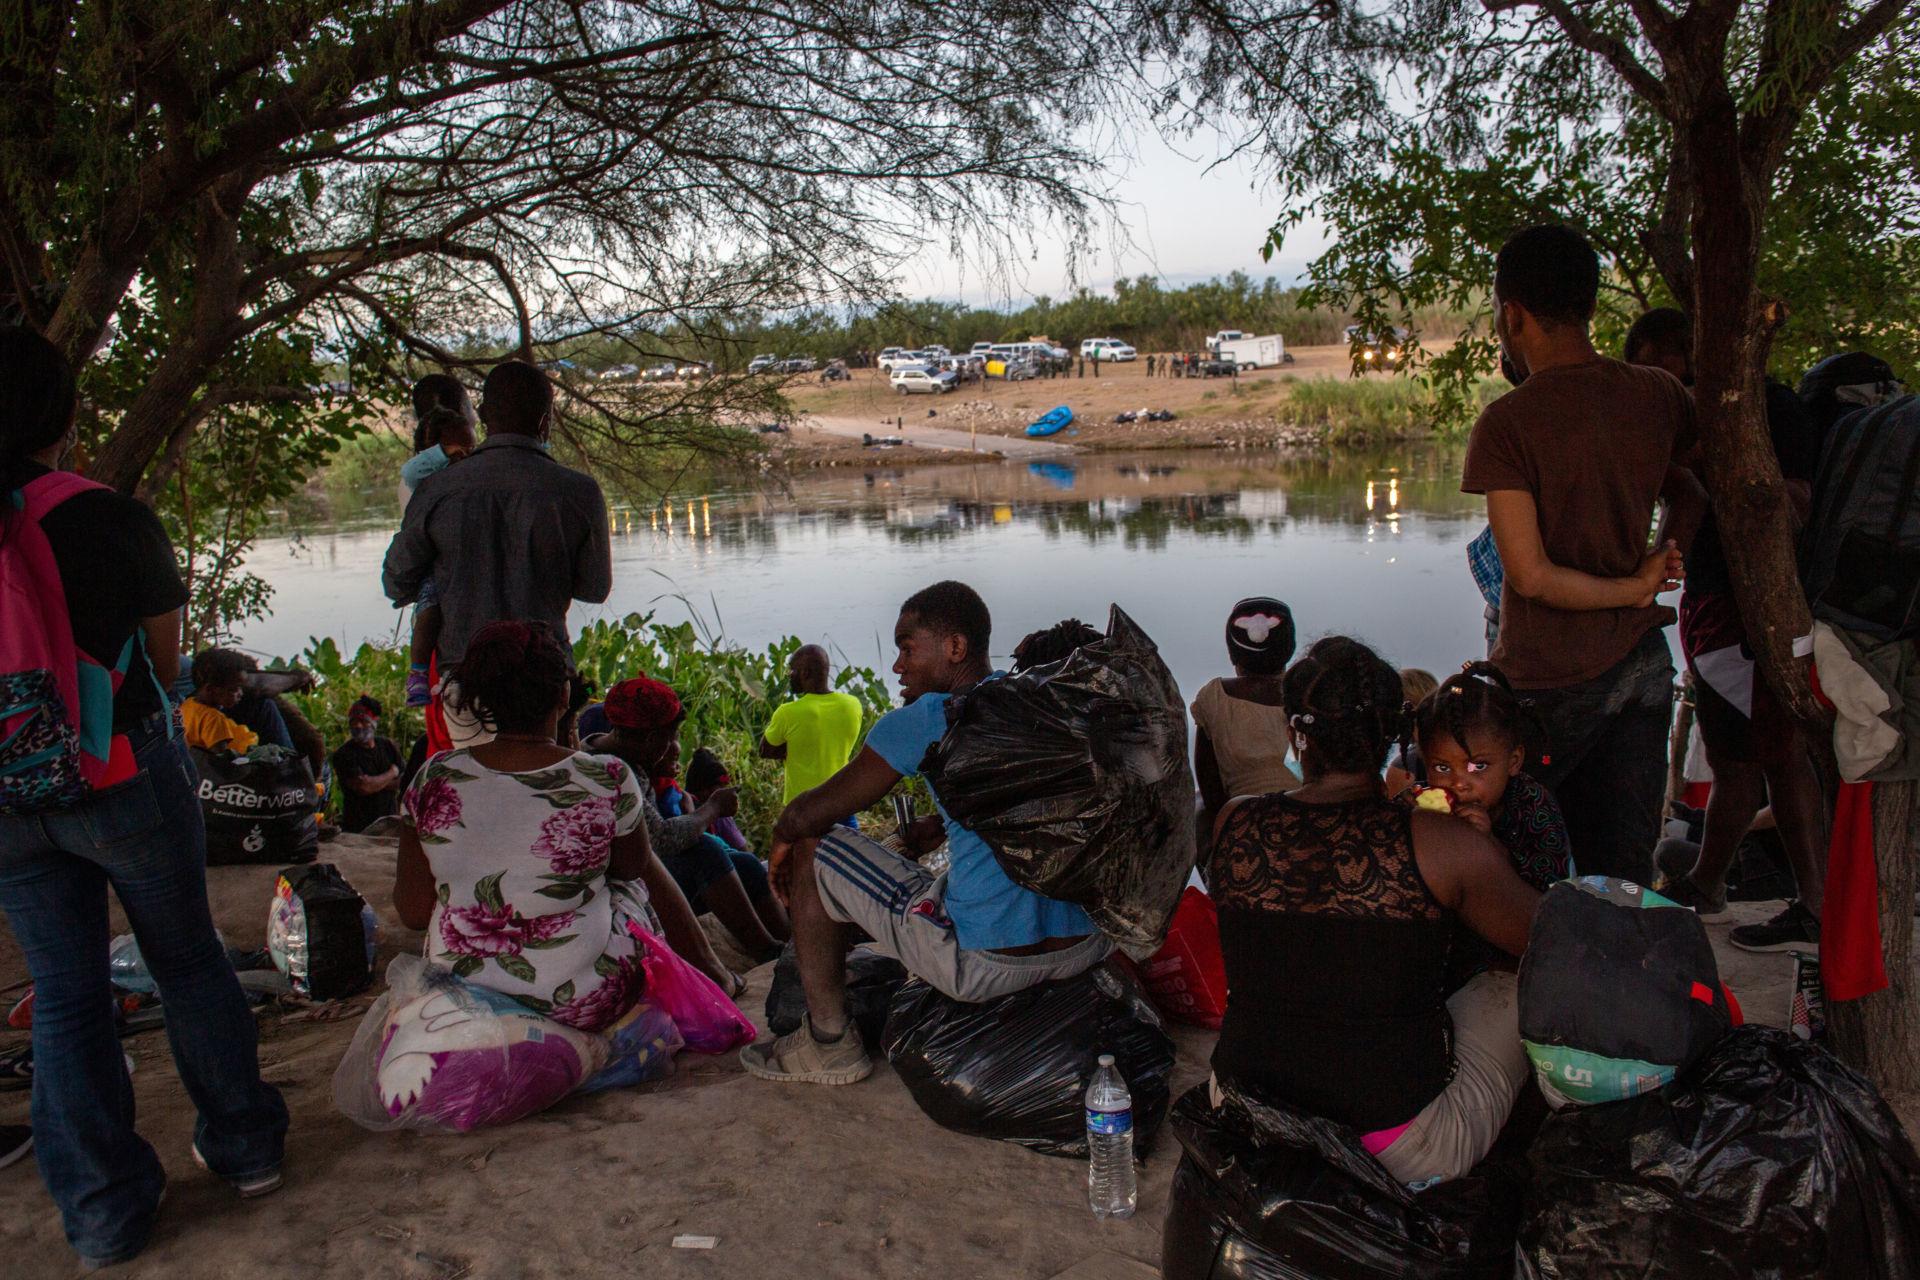 Giới chức Texas: Hiện chỉ còn 225 di dân Haiti tại thị trấn biên giới Del Rio